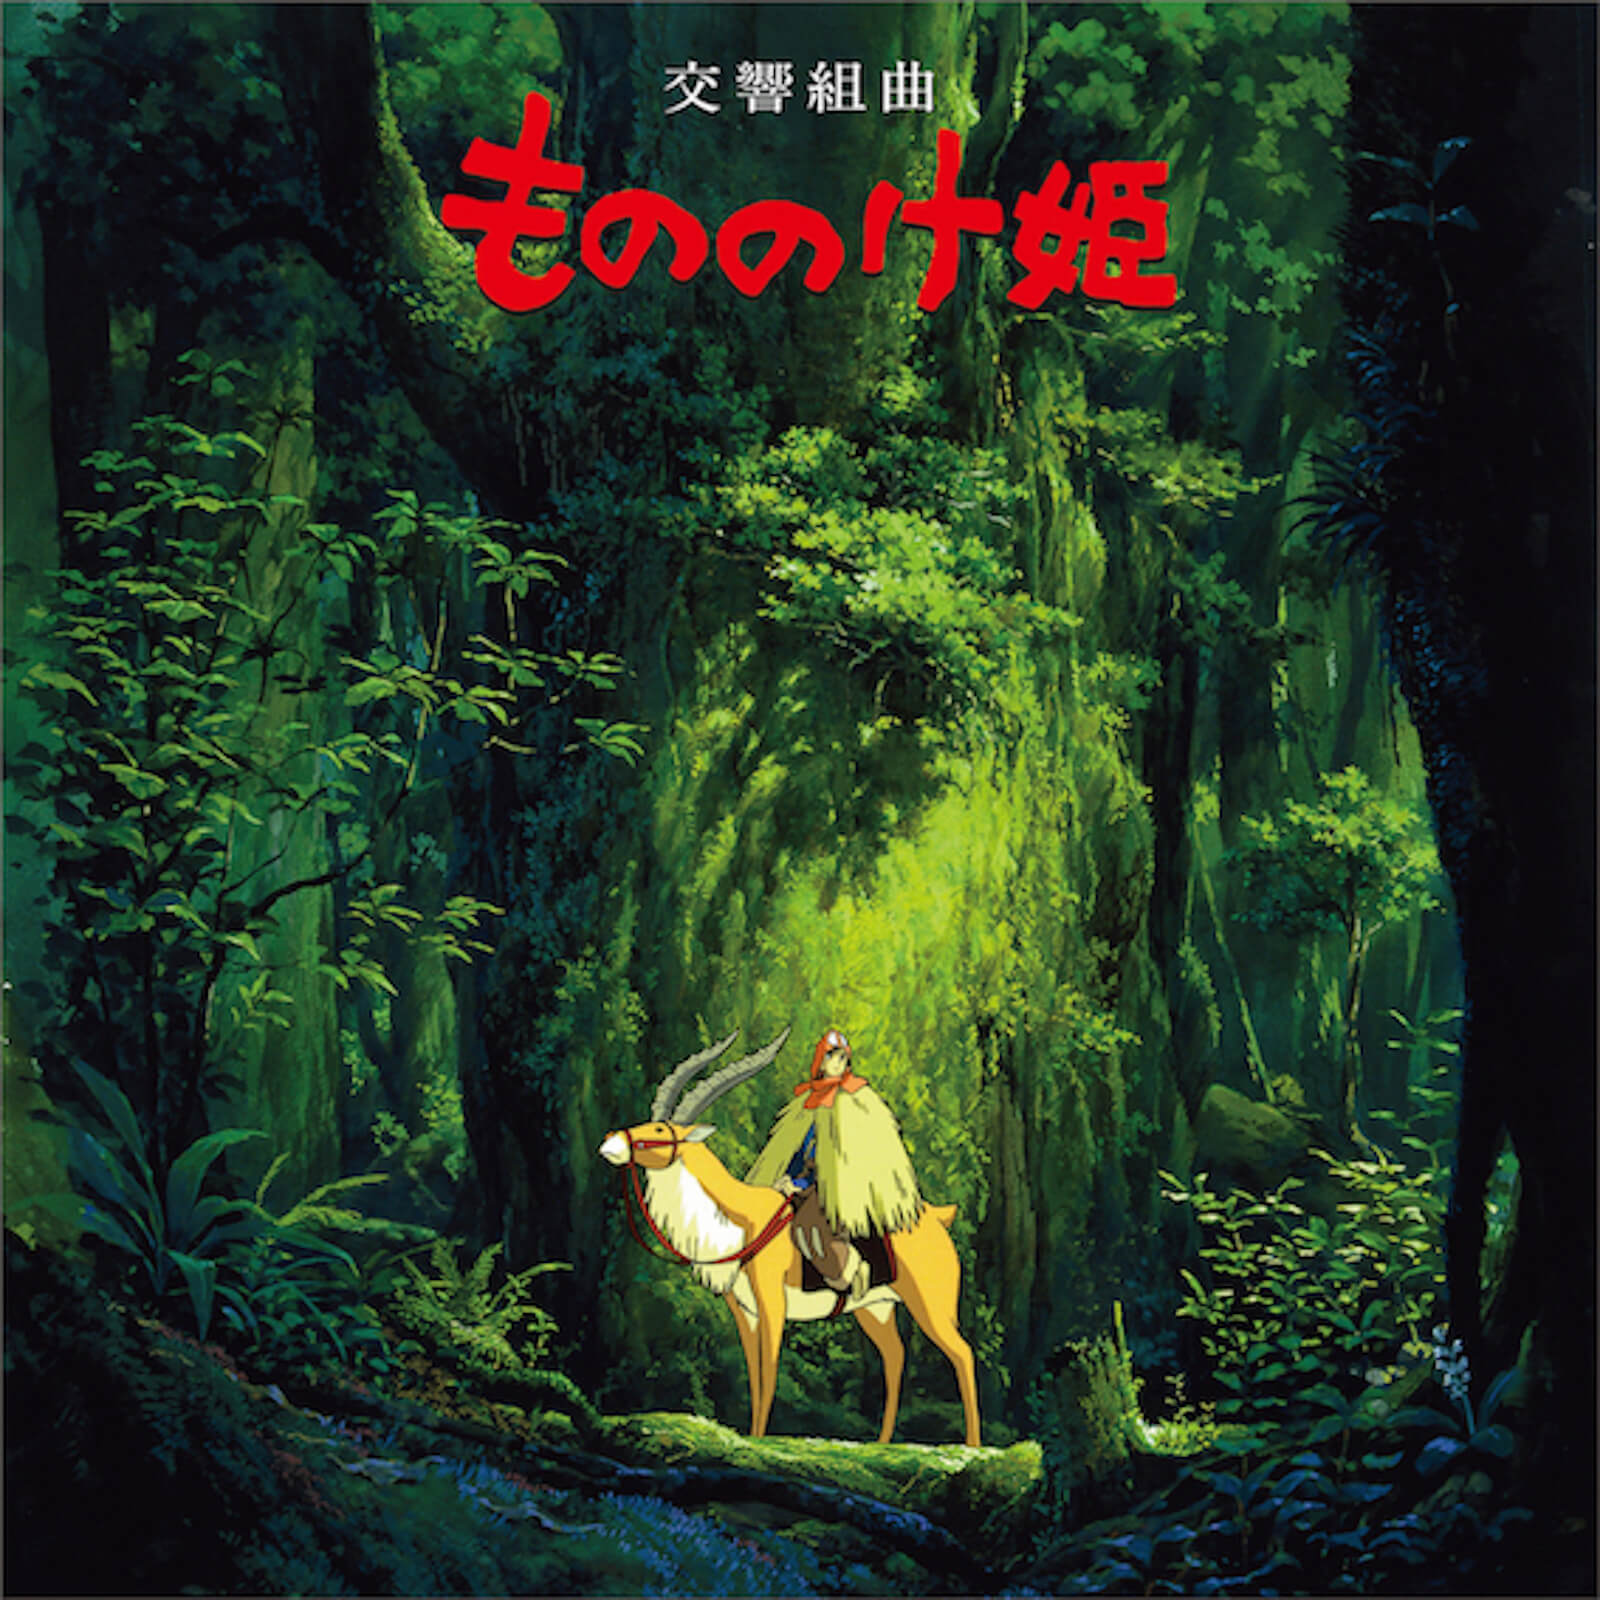 Studio Ghibli Records - Princess Mononoke (Symphonic Suite) LP